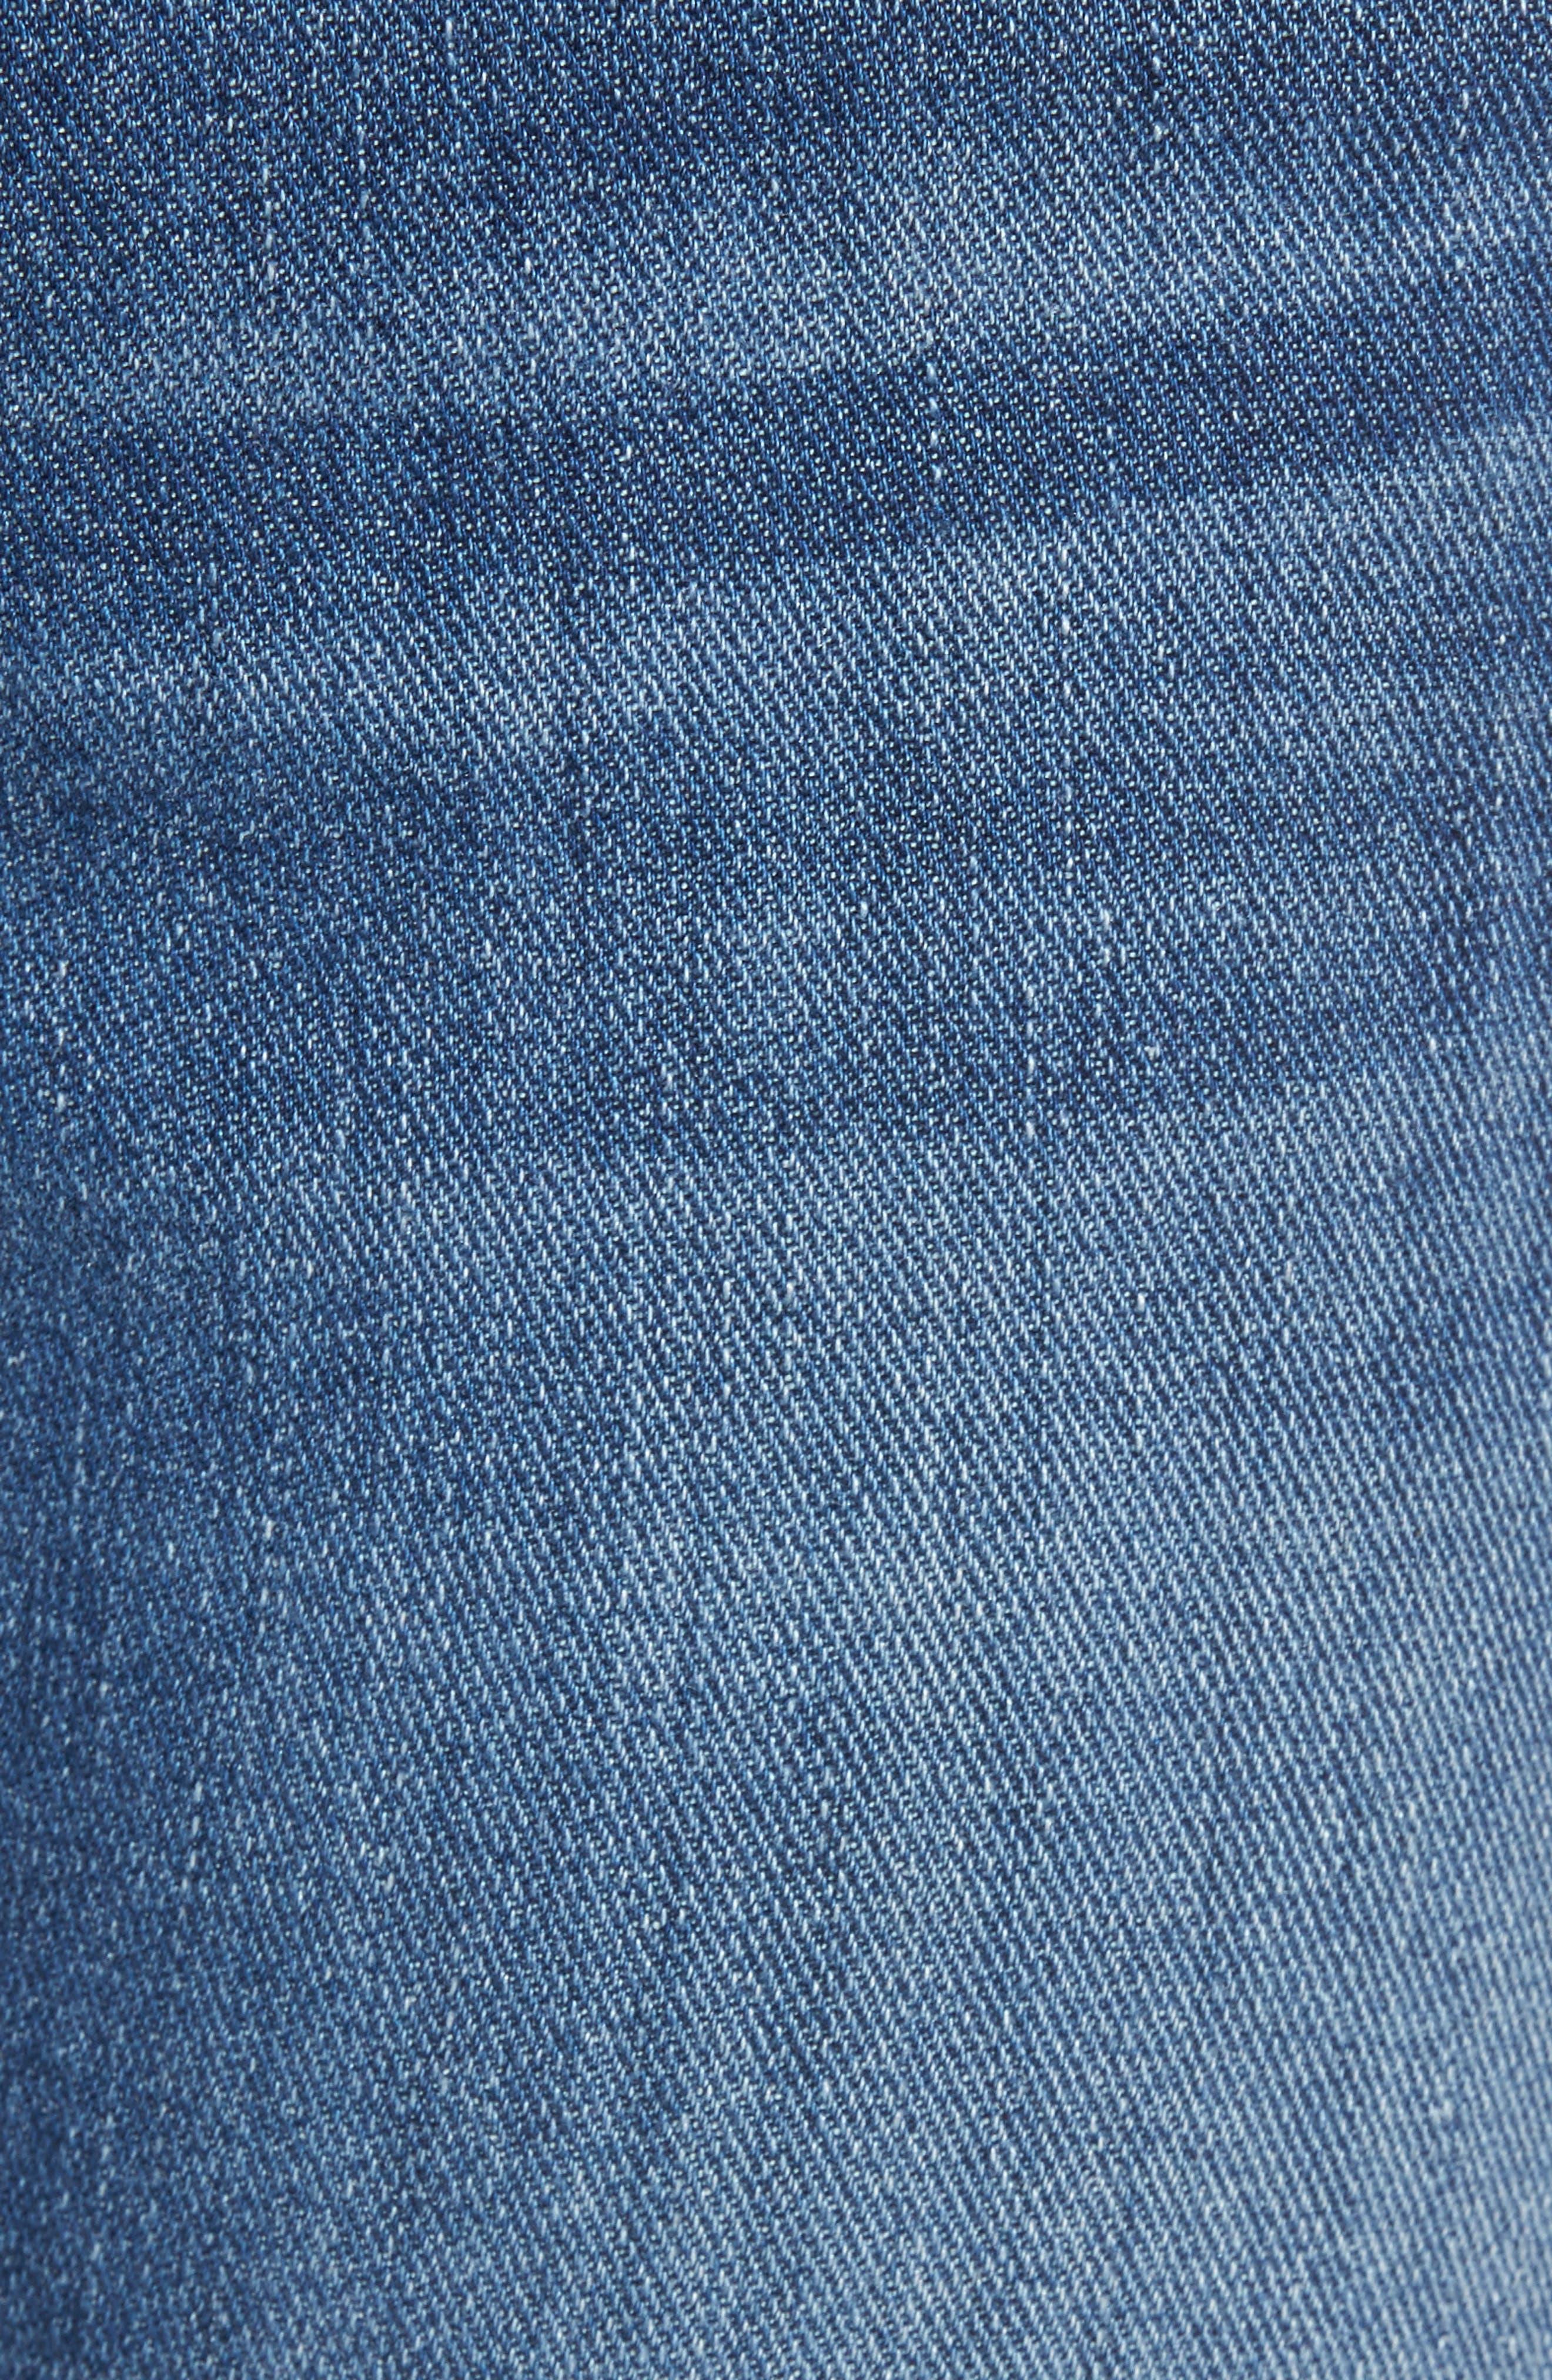 7 FOR ALL MANKIND<SUP>®</SUP>, Ali Split Hem Crop Flare Jeans, Alternate thumbnail 5, color, 401